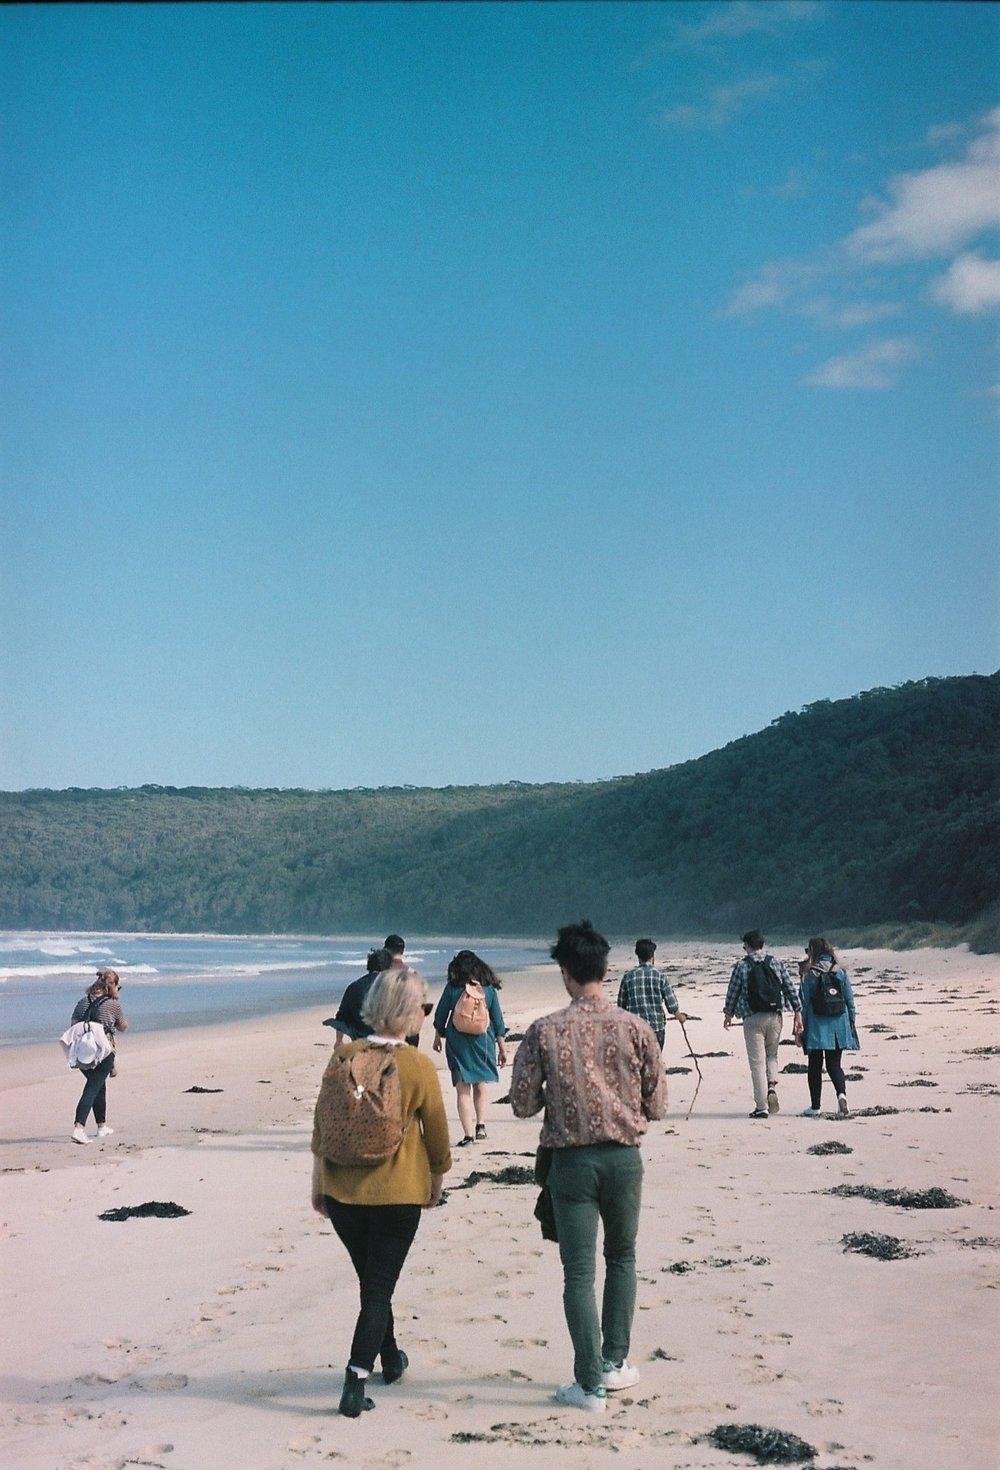 Croajingolong National Park on Film, 2017